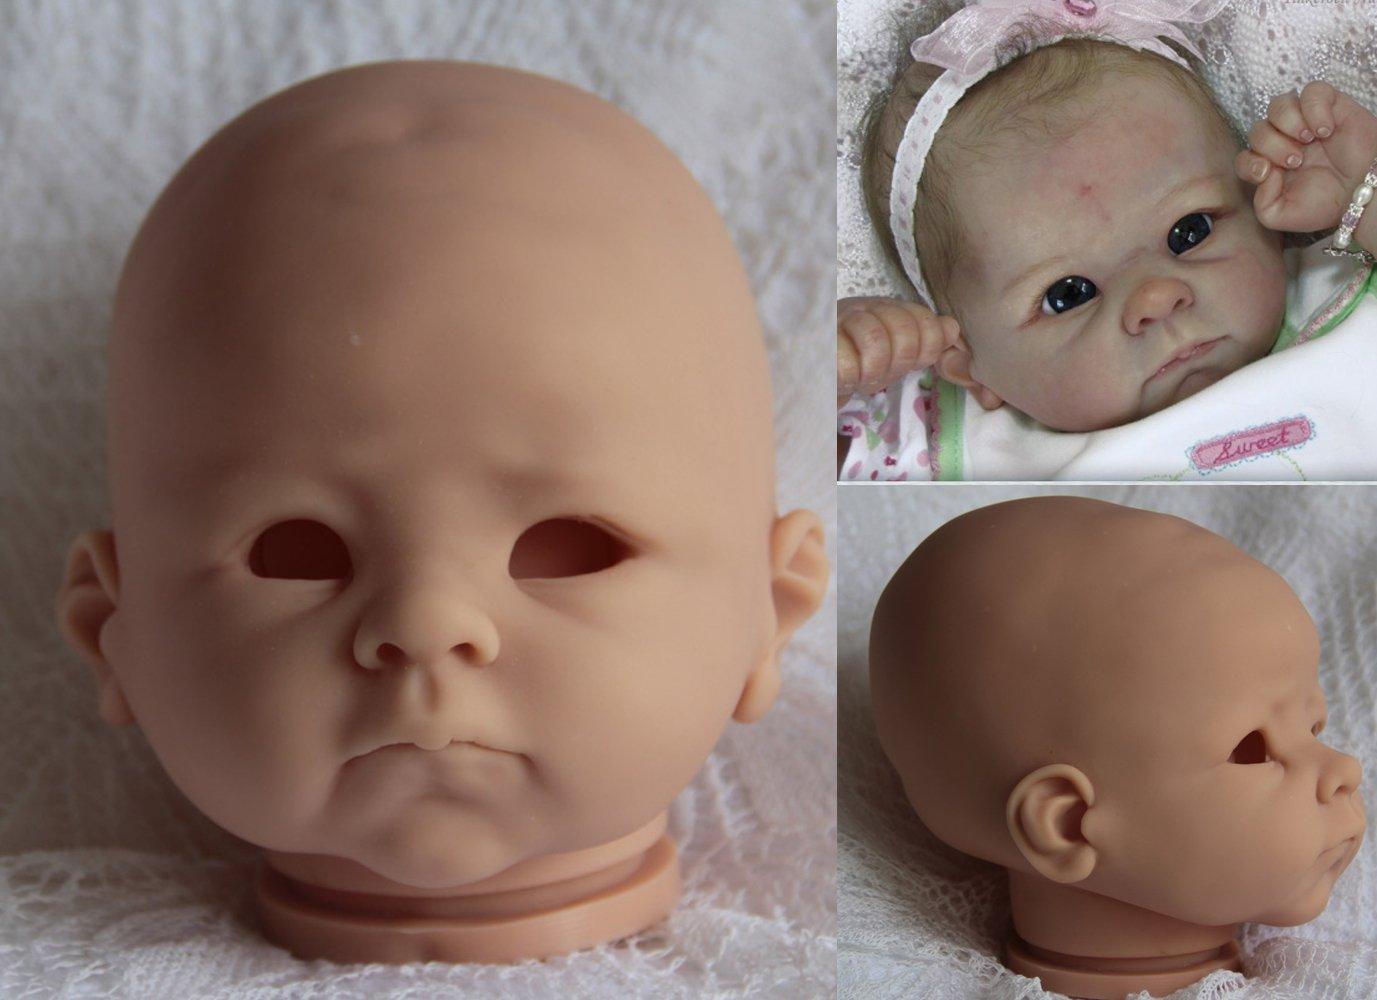 22/'/' Doll Unpainted Vinyl Silicone Kit Reborn Baby Doll Limbs Head /& 3//4 Arm Leg